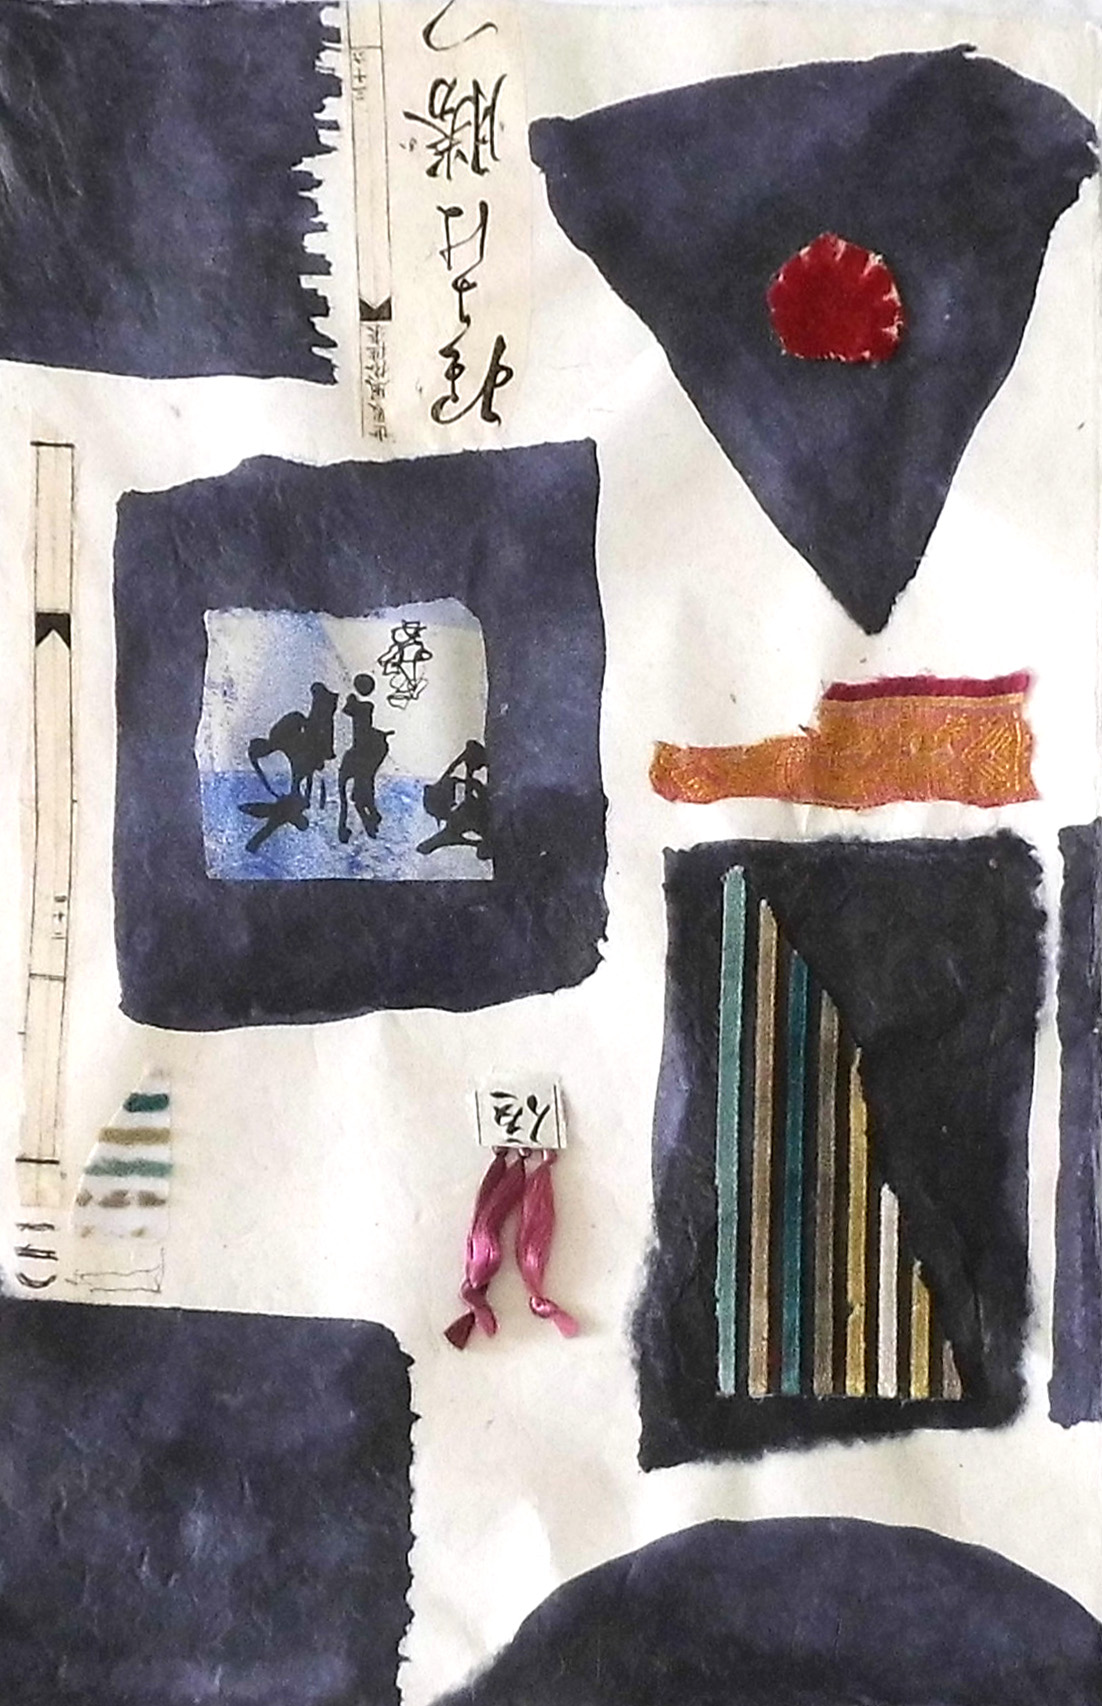 02-Strawalde-Erinnerung an Kyoto-2016-Mixed Media-52x34